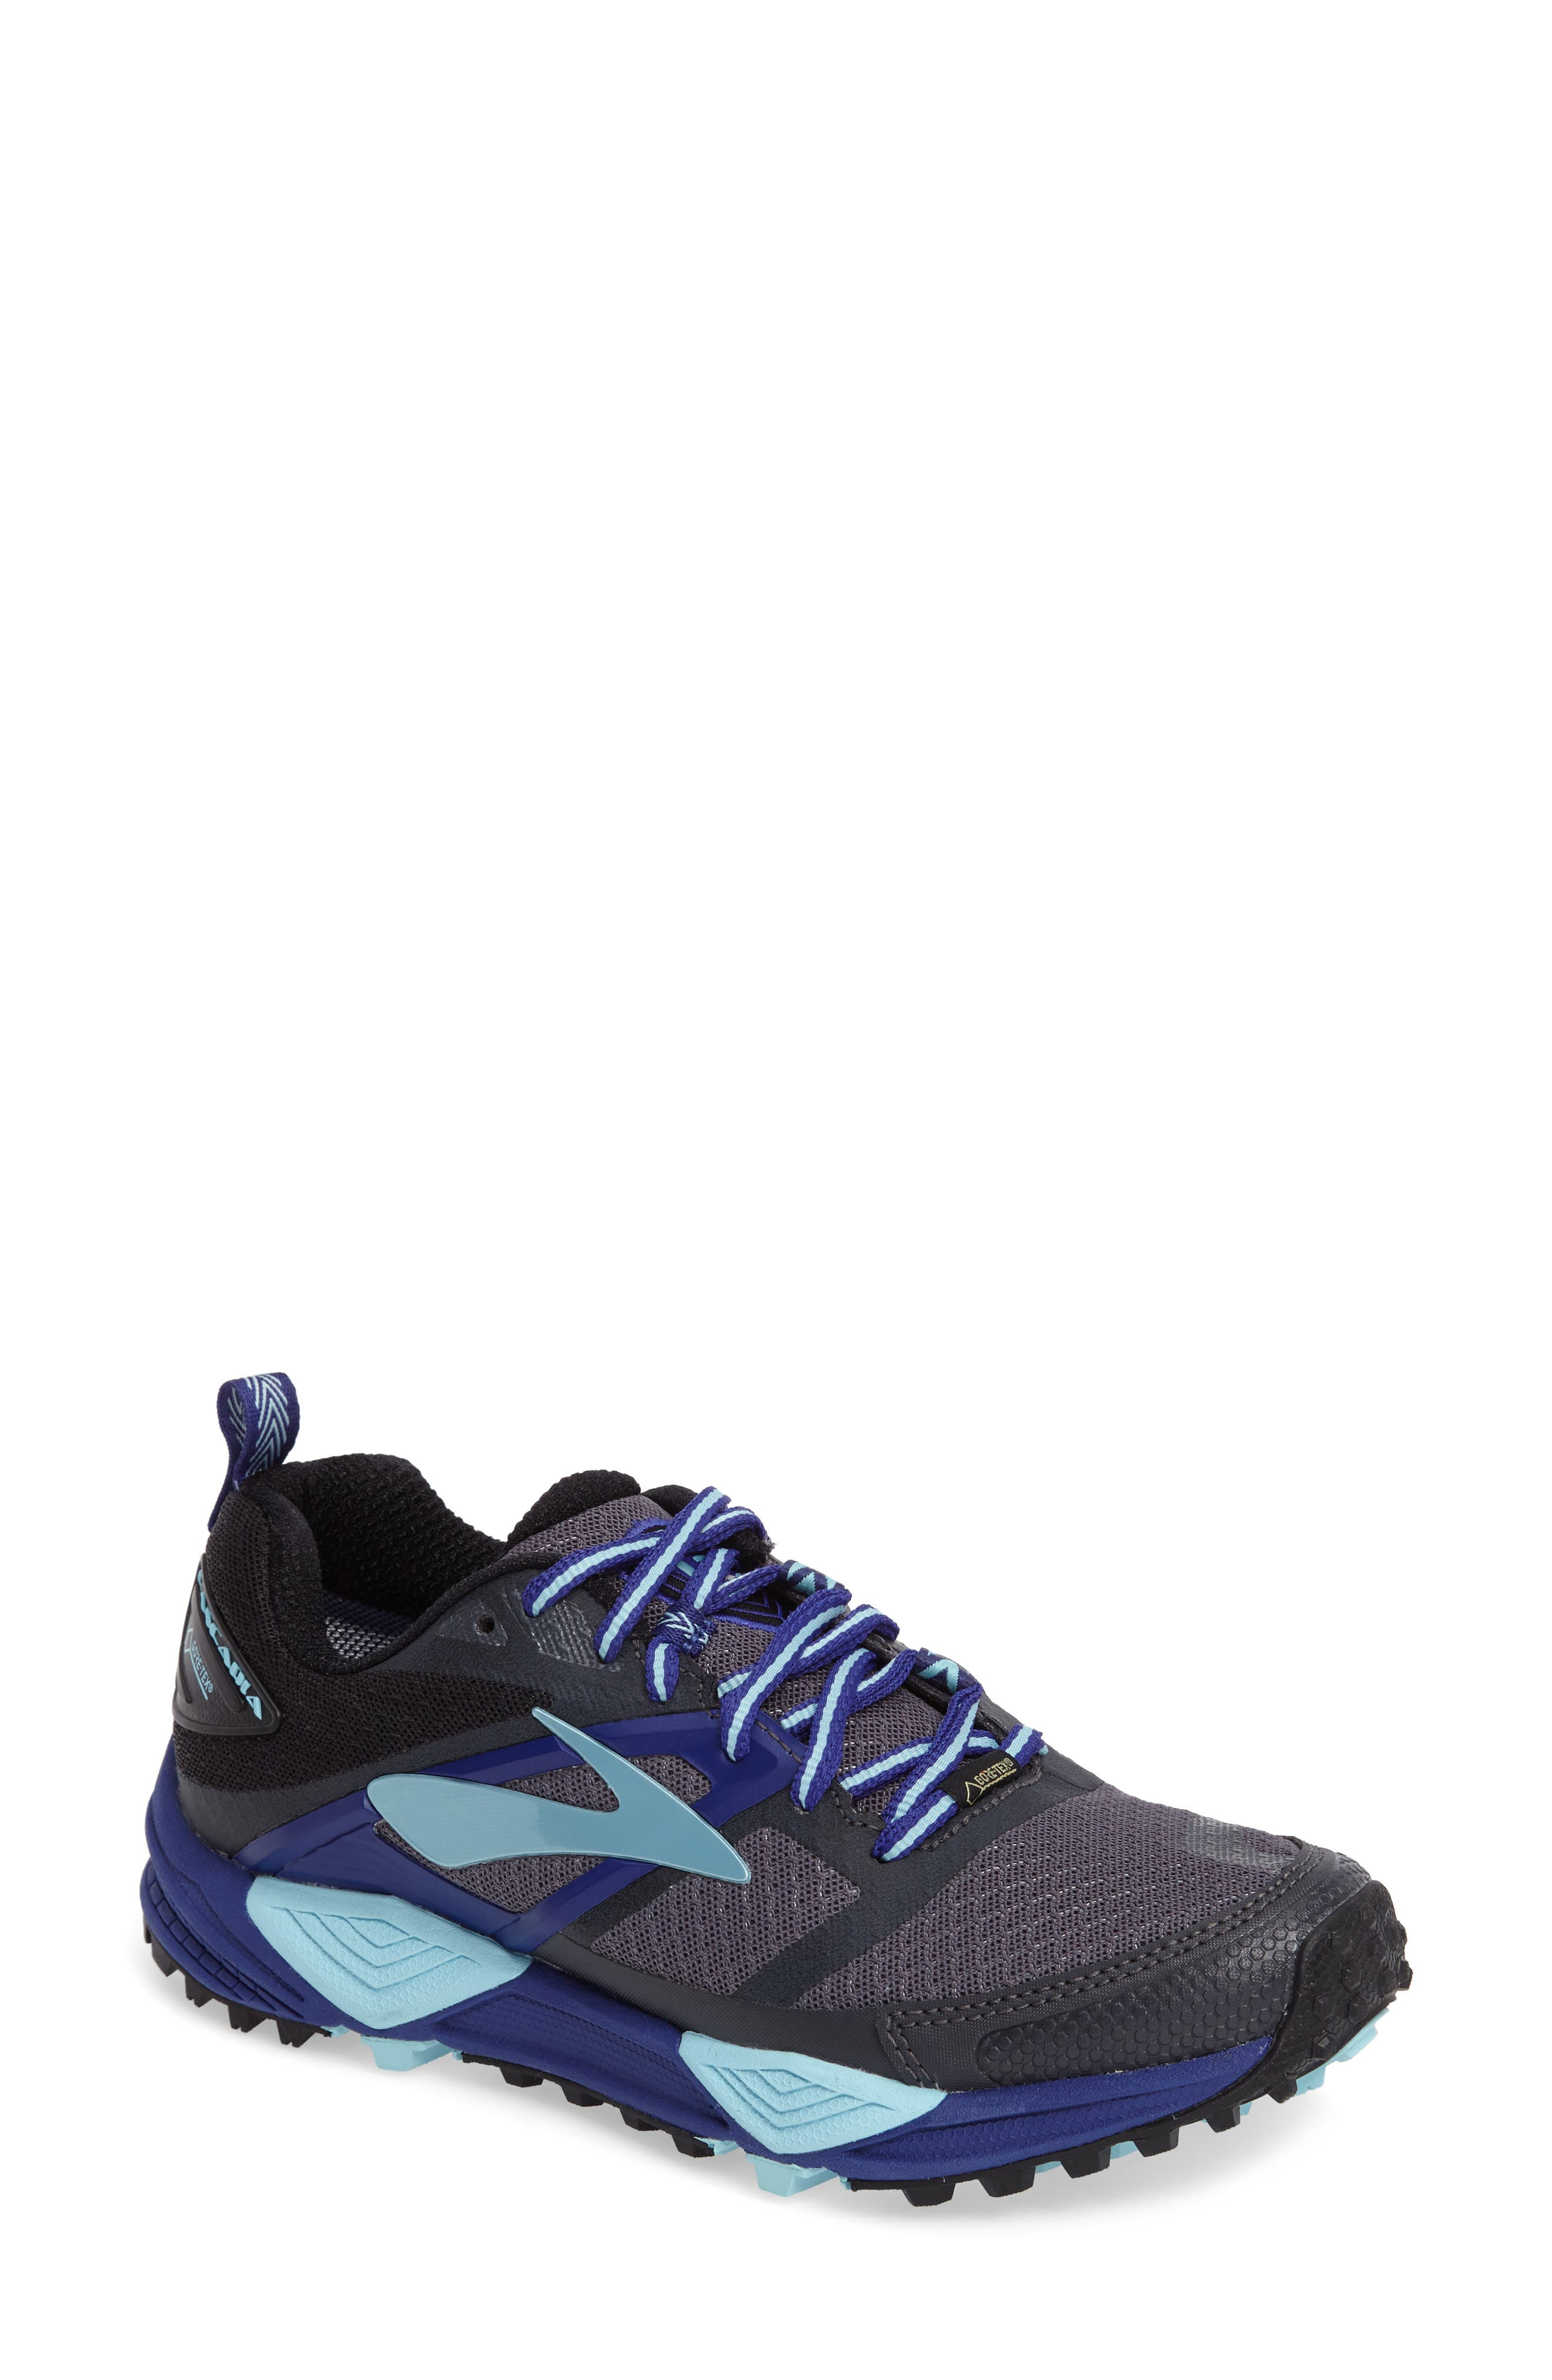 BROOKS Cascadia 12 GTX Trail Running Shoe